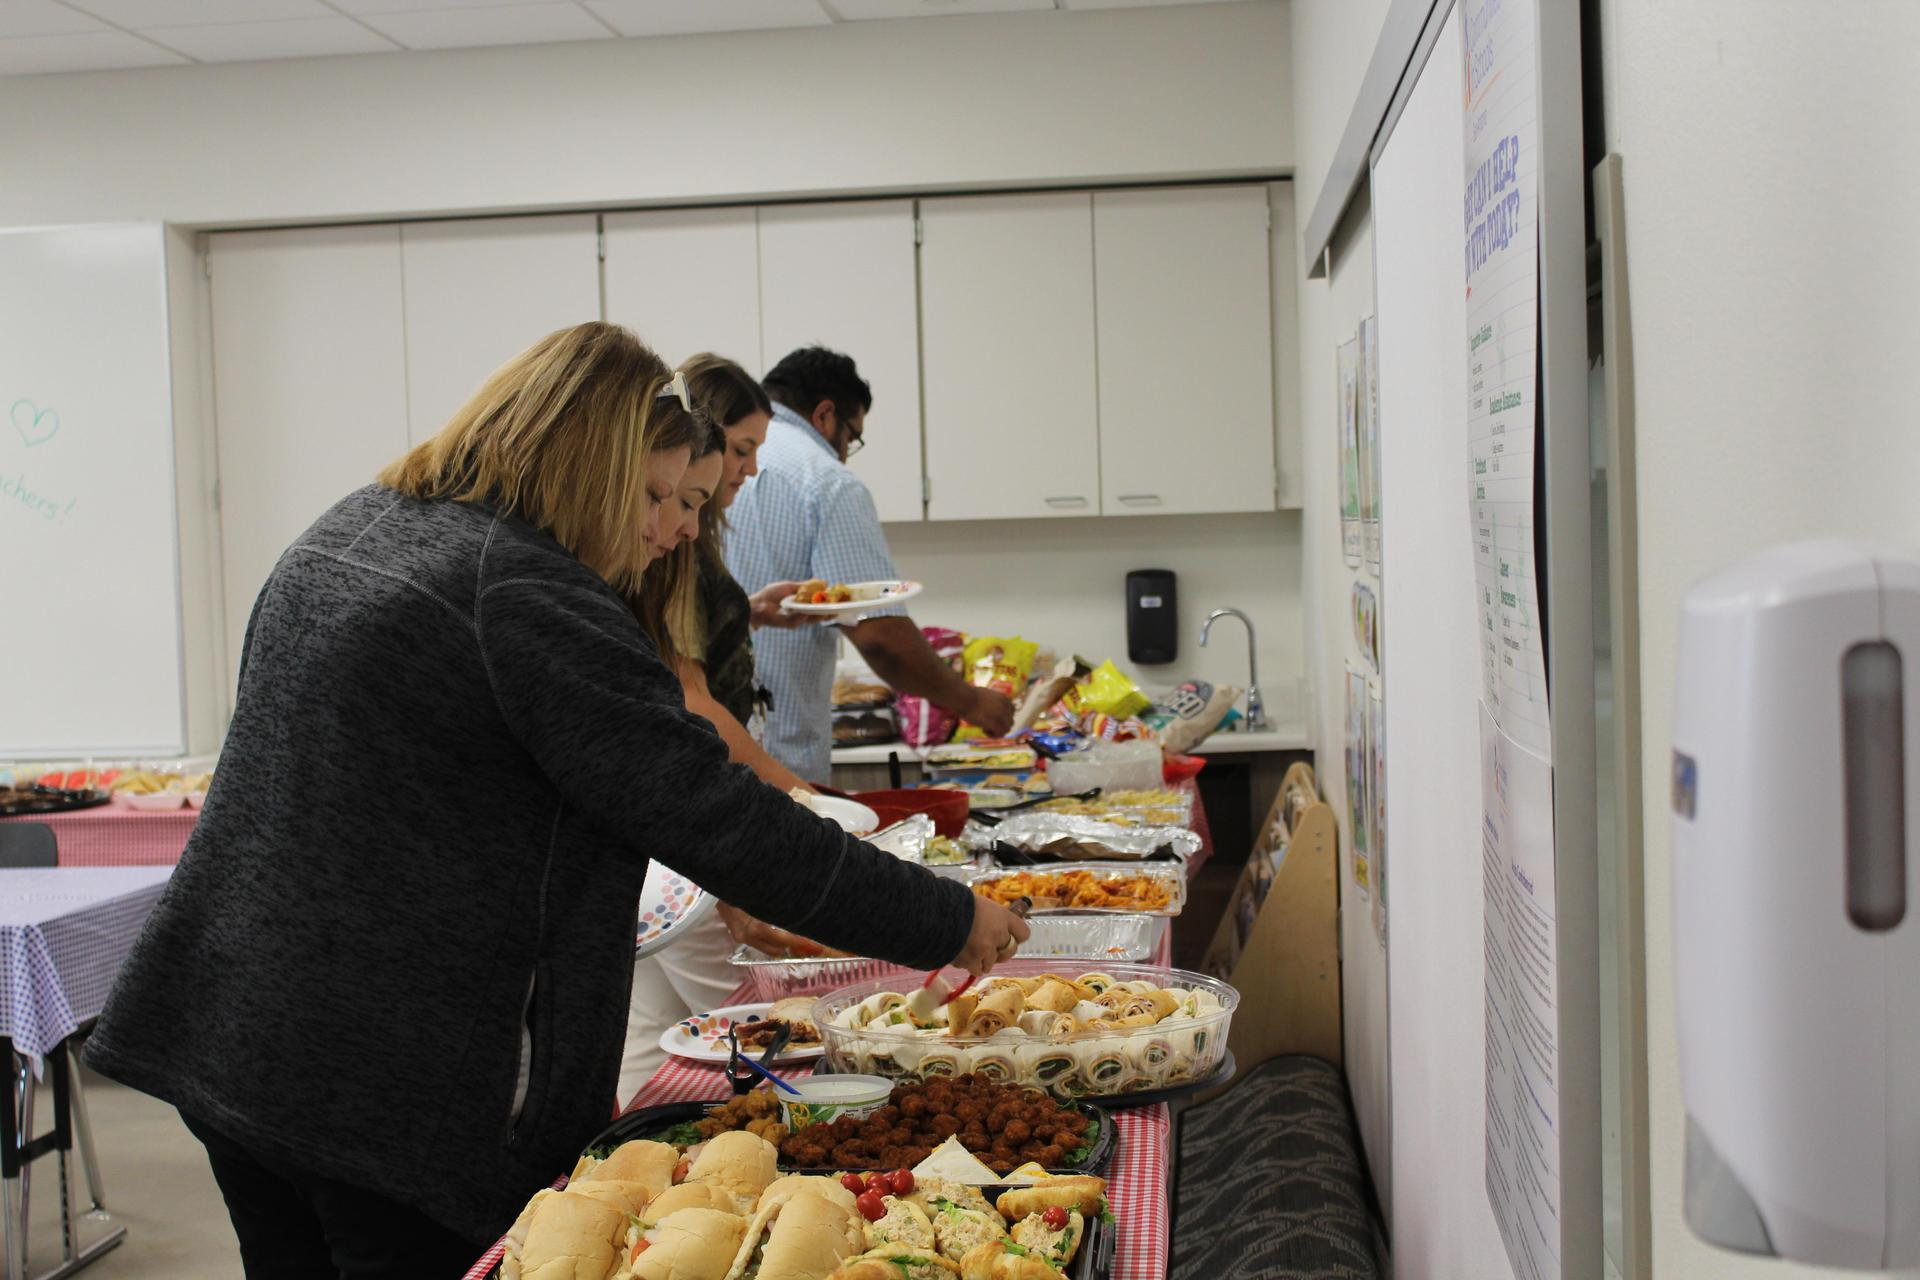 Teachers getting lunch